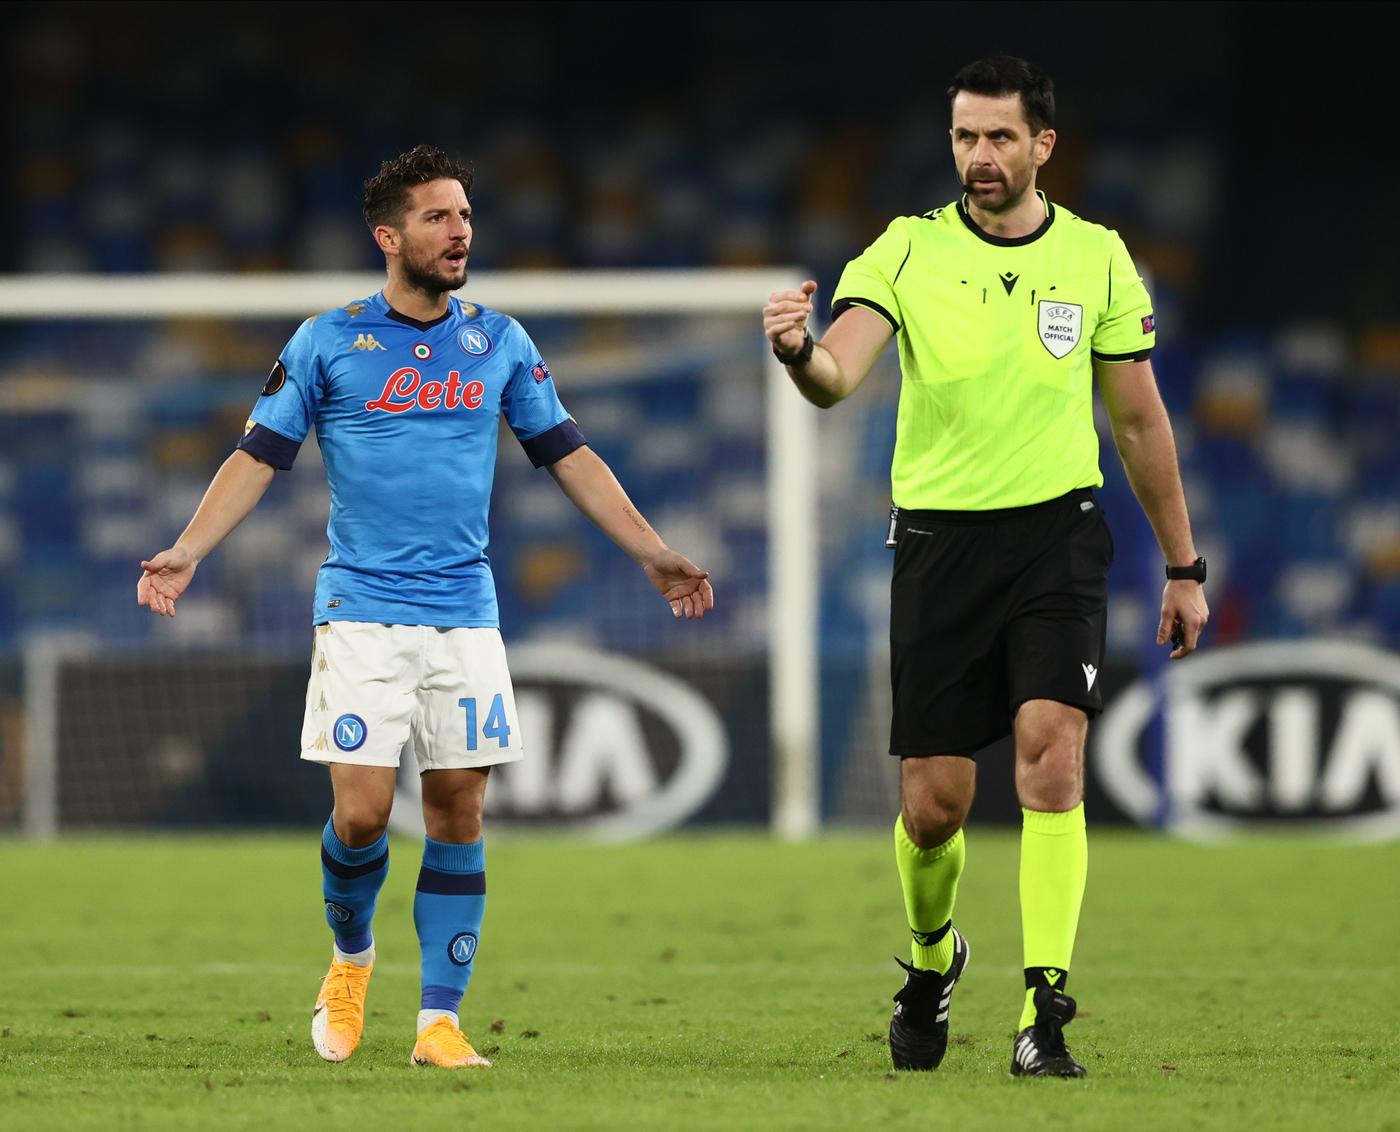 VIDEO - Bologna-Sampdoria 1-2 |  goal di Thorsby e Orsolini |  autogoal di Regini